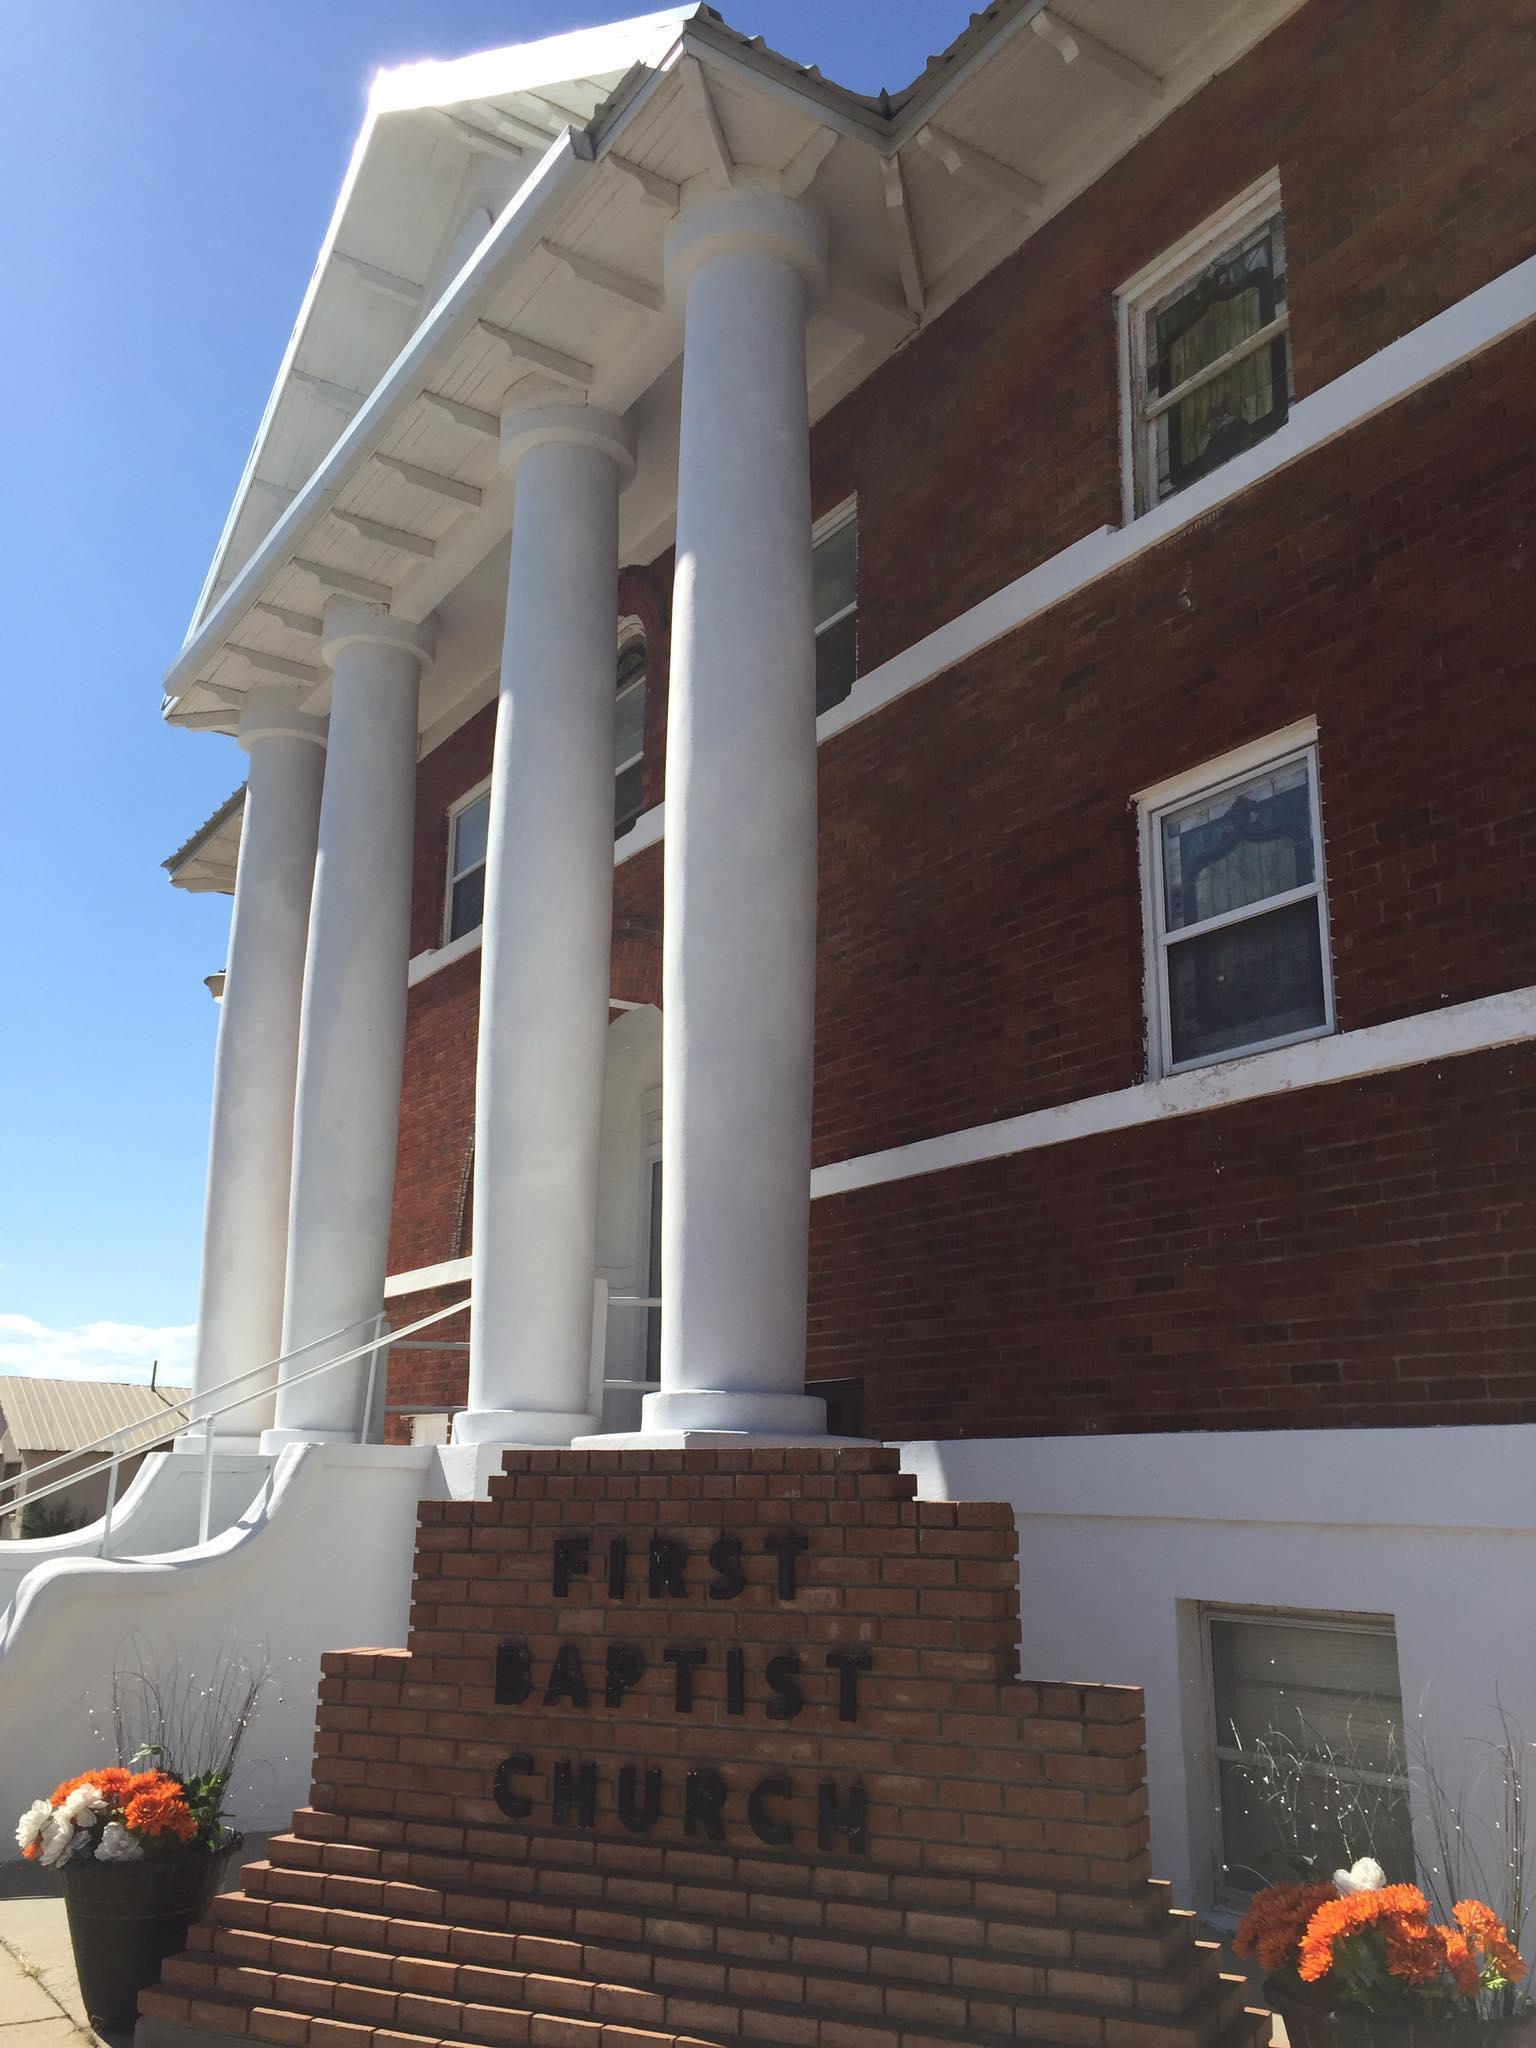 NM, Clayton - FIRST BAPTIST CHURCH